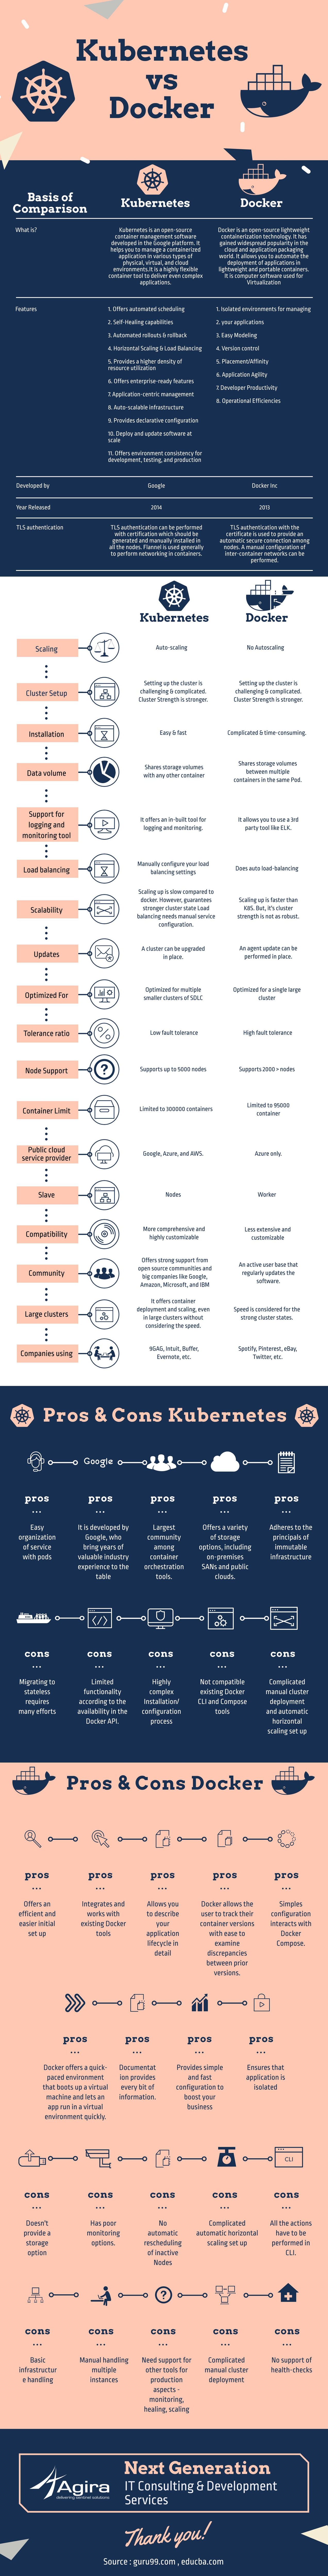 Kubernetes vs Docker - comparison